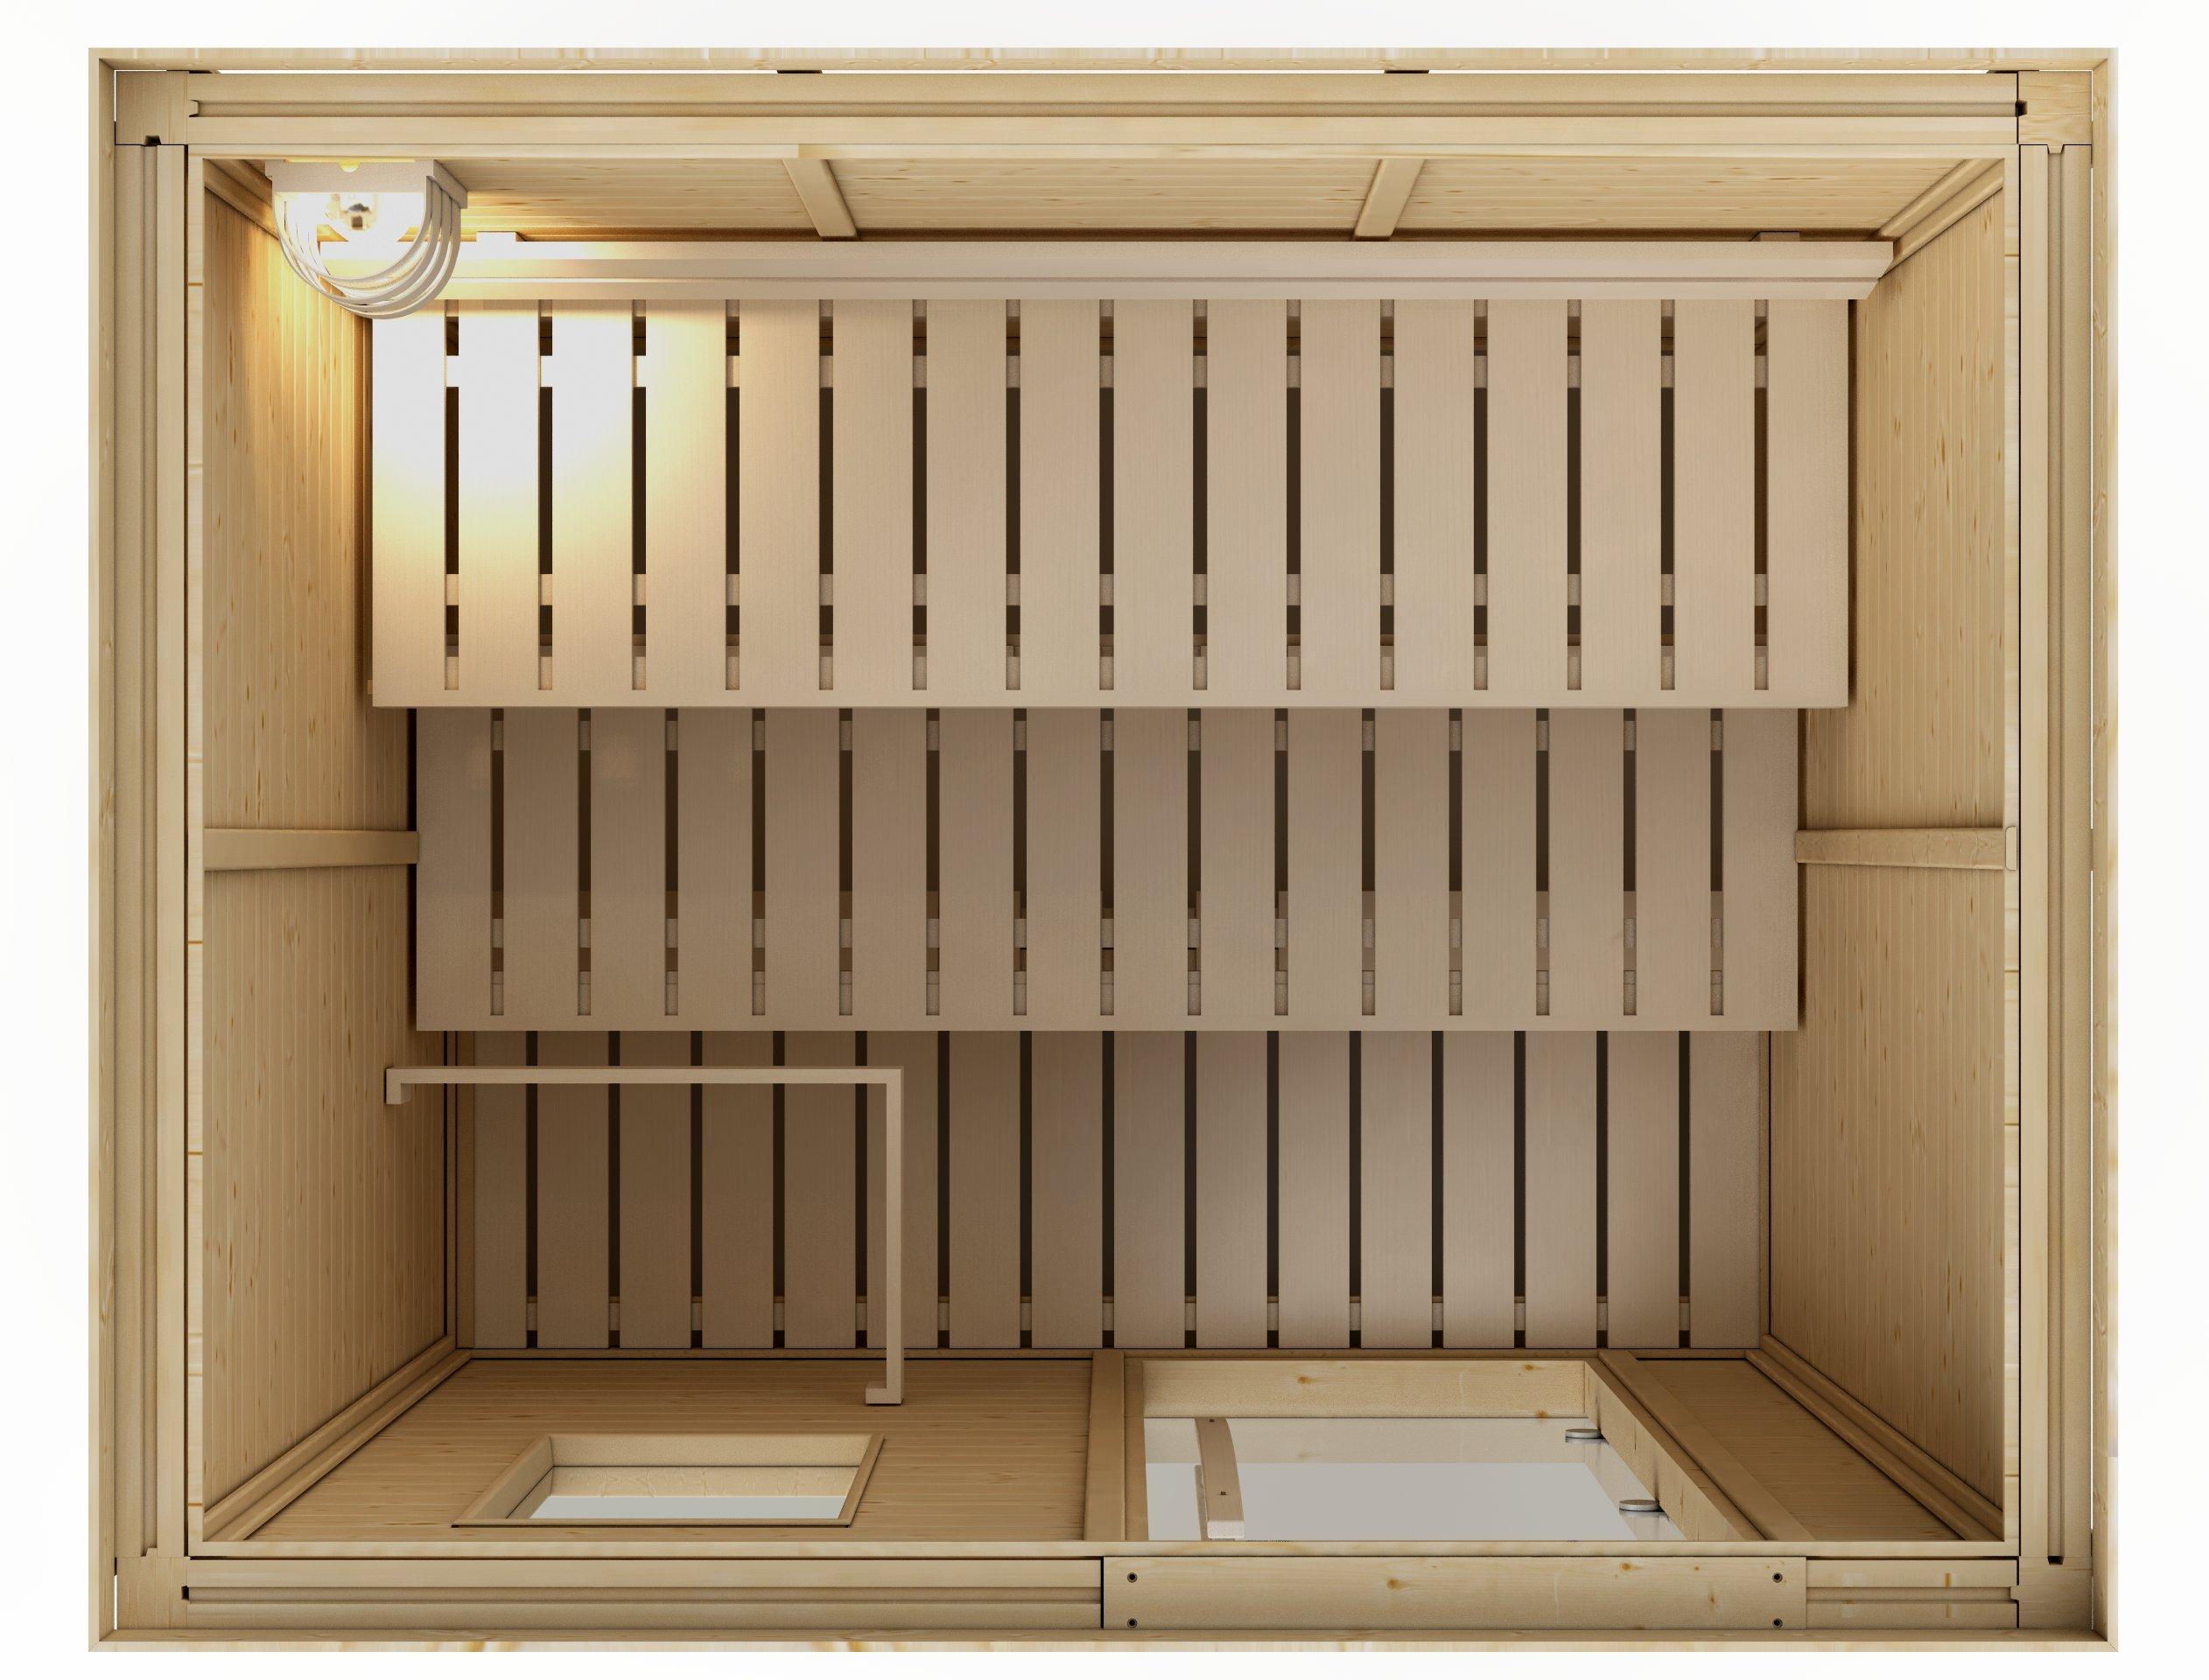 Goldstar 1250 Prebuilt Traditional Sauna w/ Canopy & Lights by Goldstar